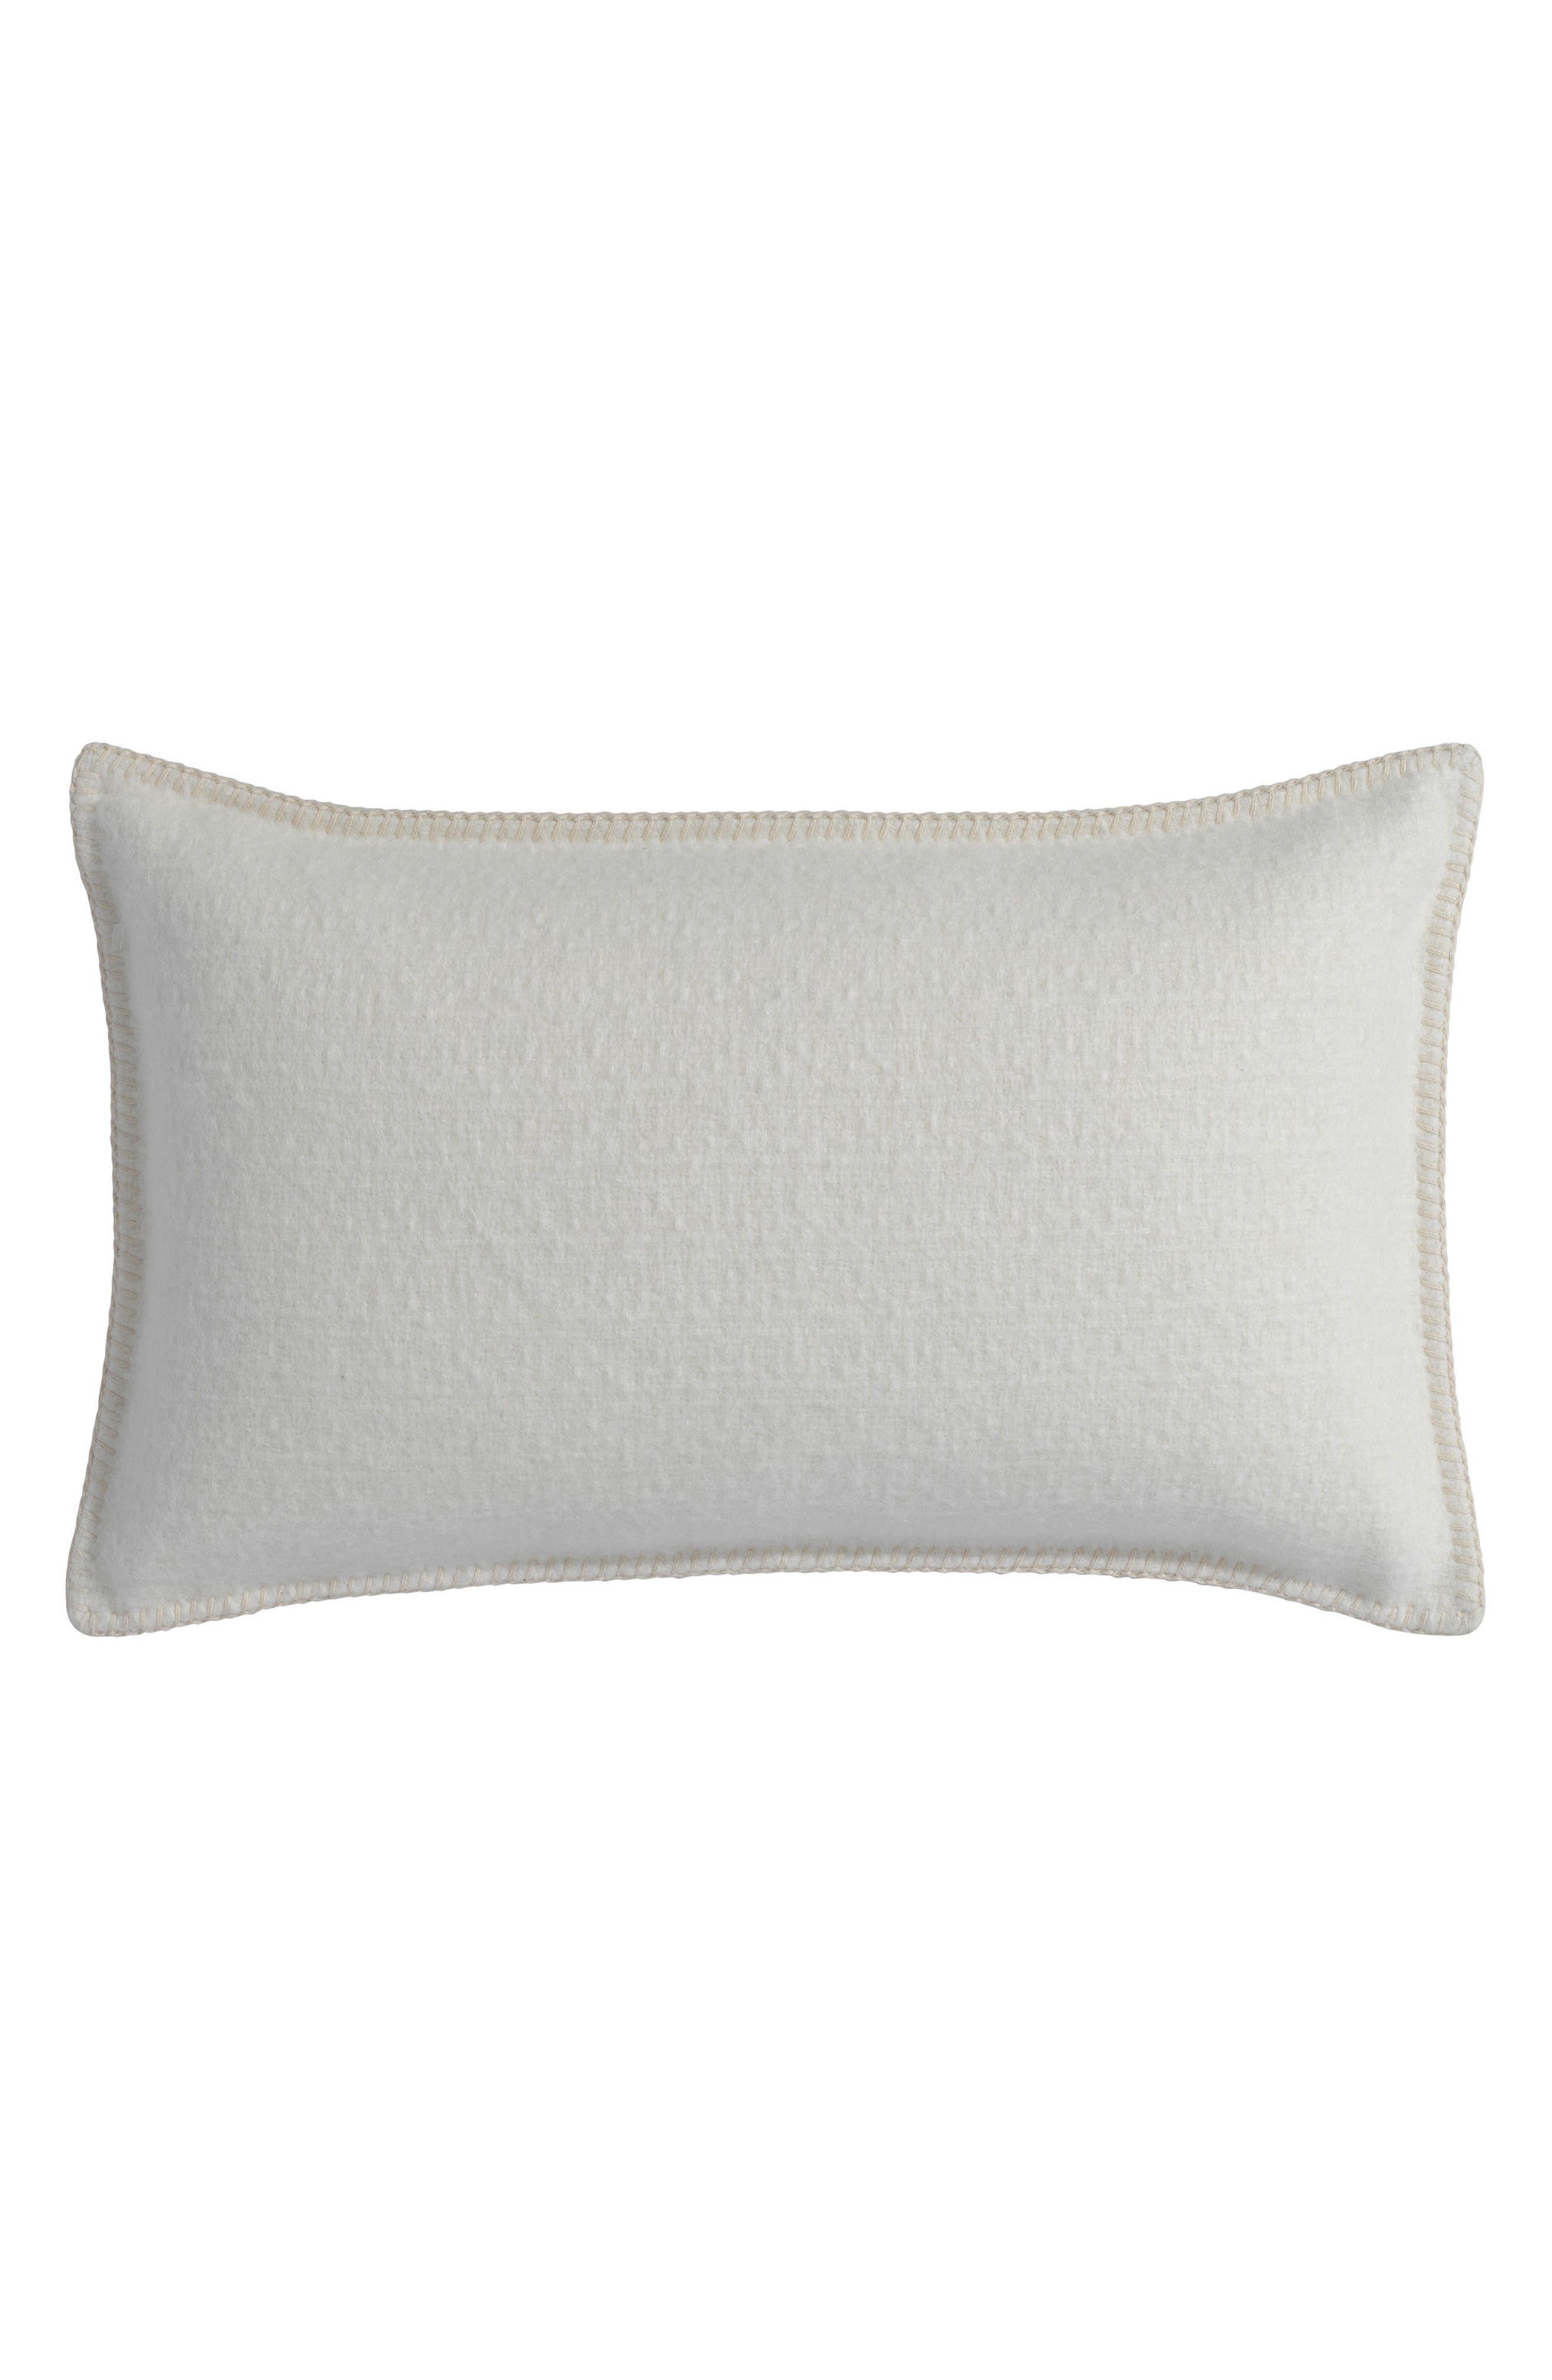 Basketweave Alpaca Accent Pillow,                         Main,                         color, Ivory